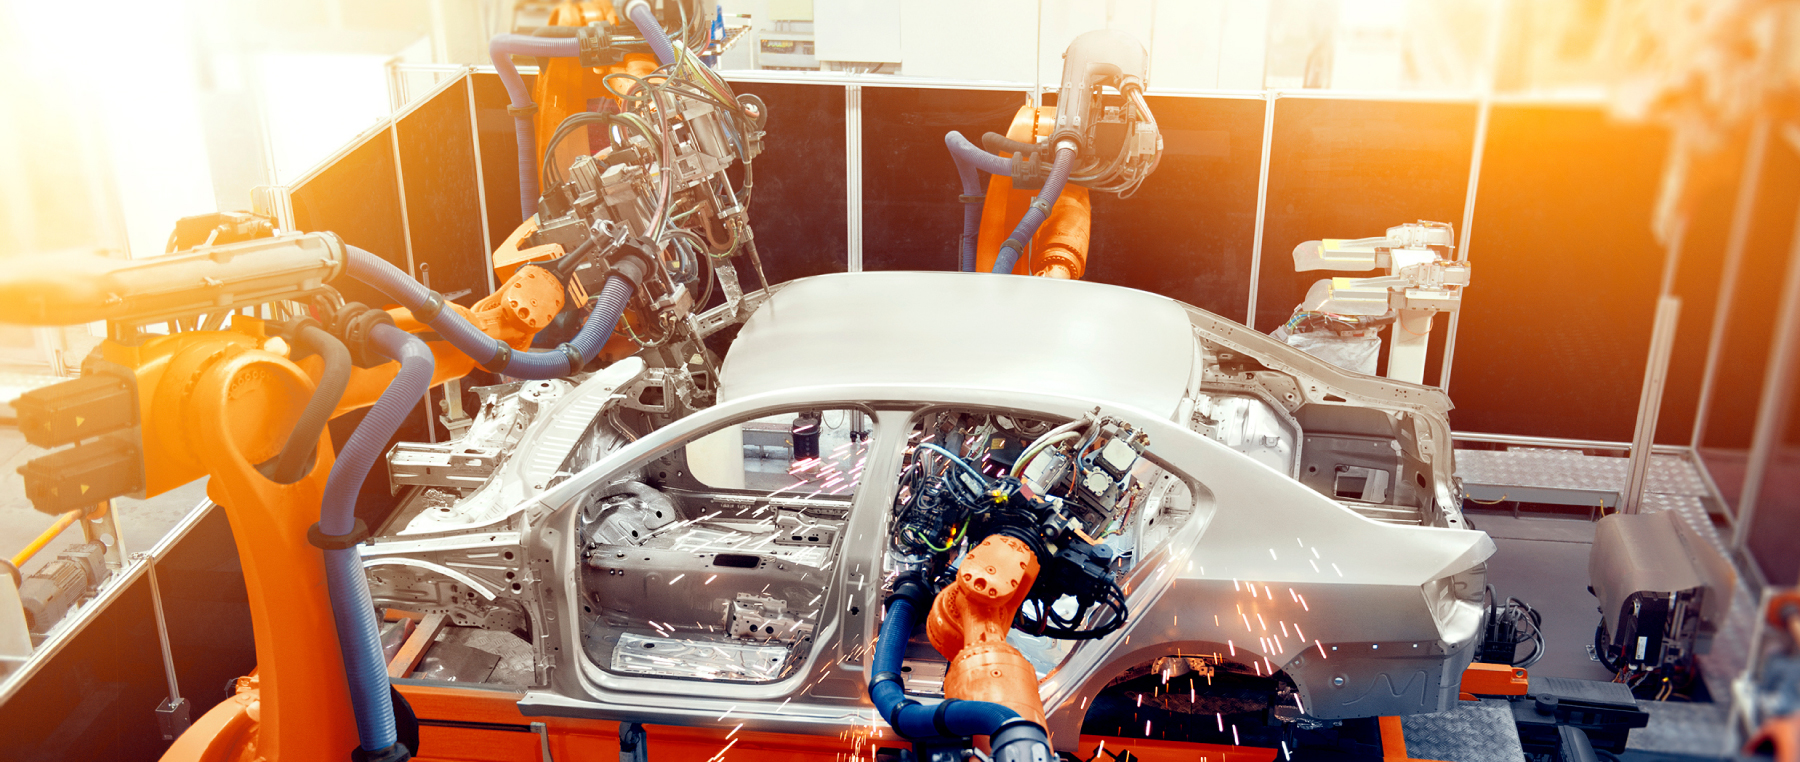 Choosing an air compressor for automotive applications